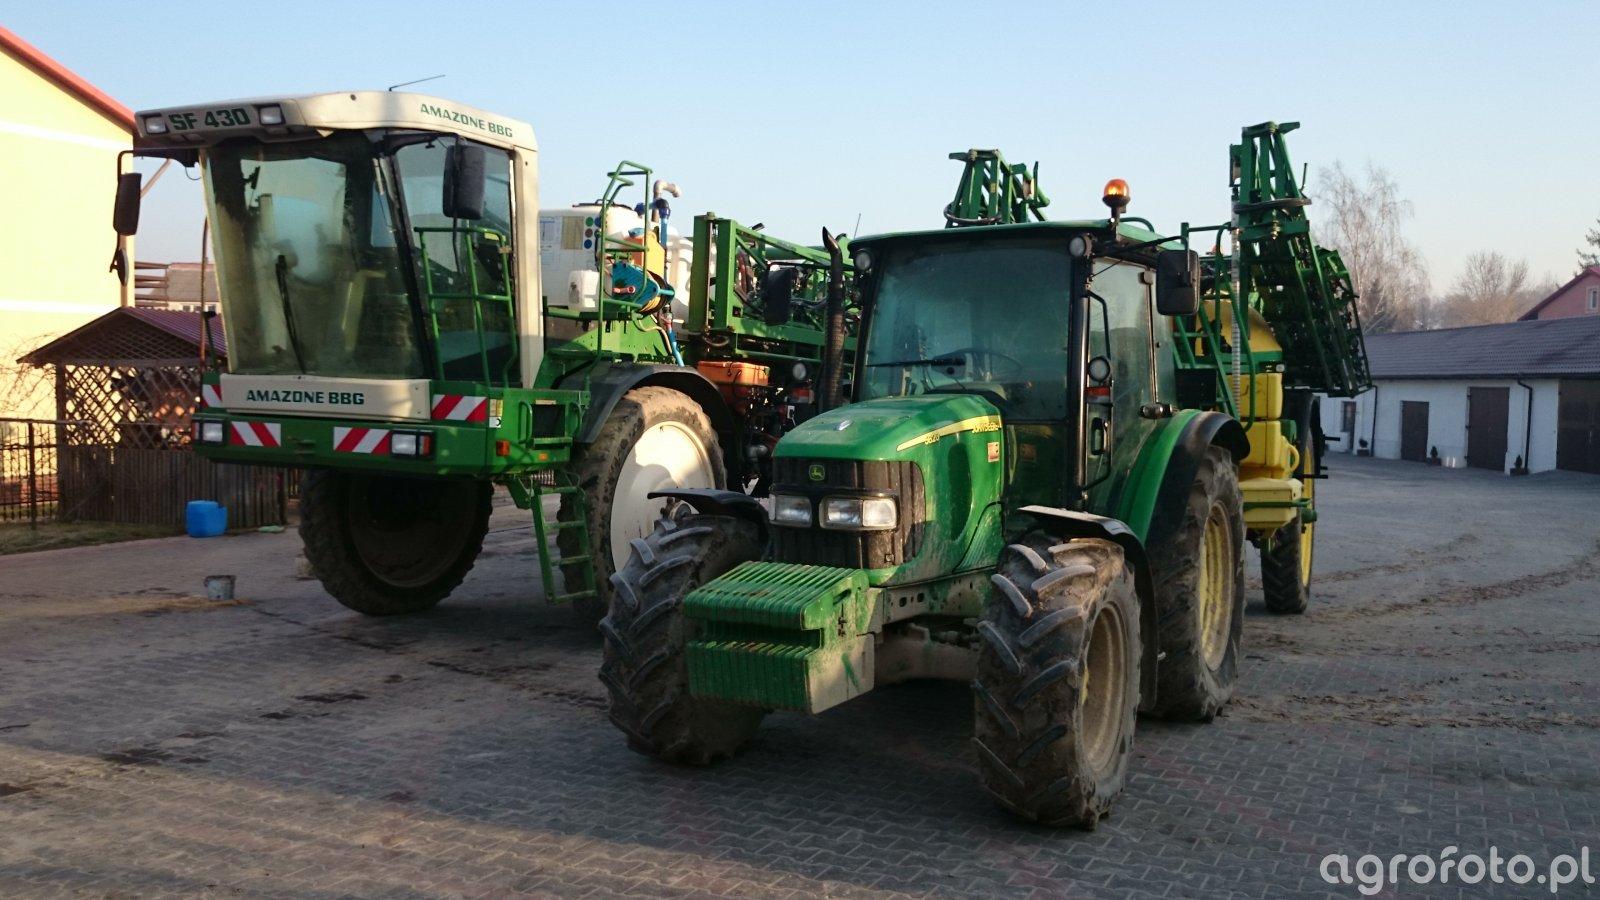 Amazone sf430 + John Deere 5820 i John Deere 840